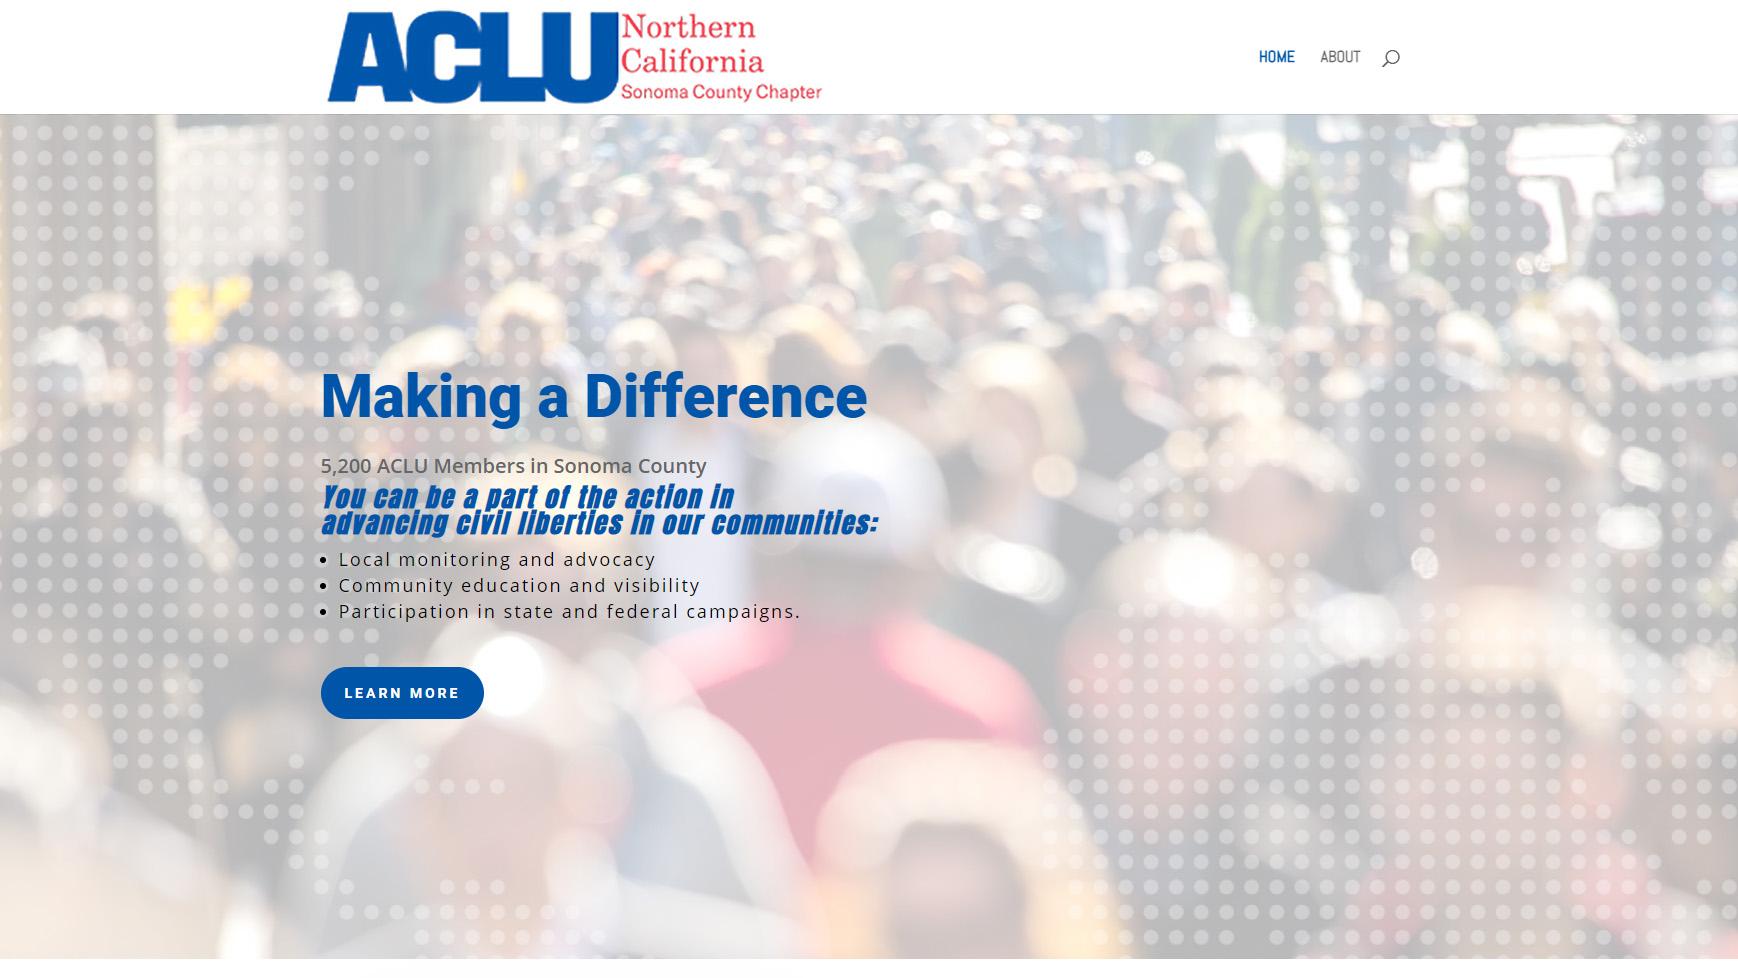 ACLU Northern California new website